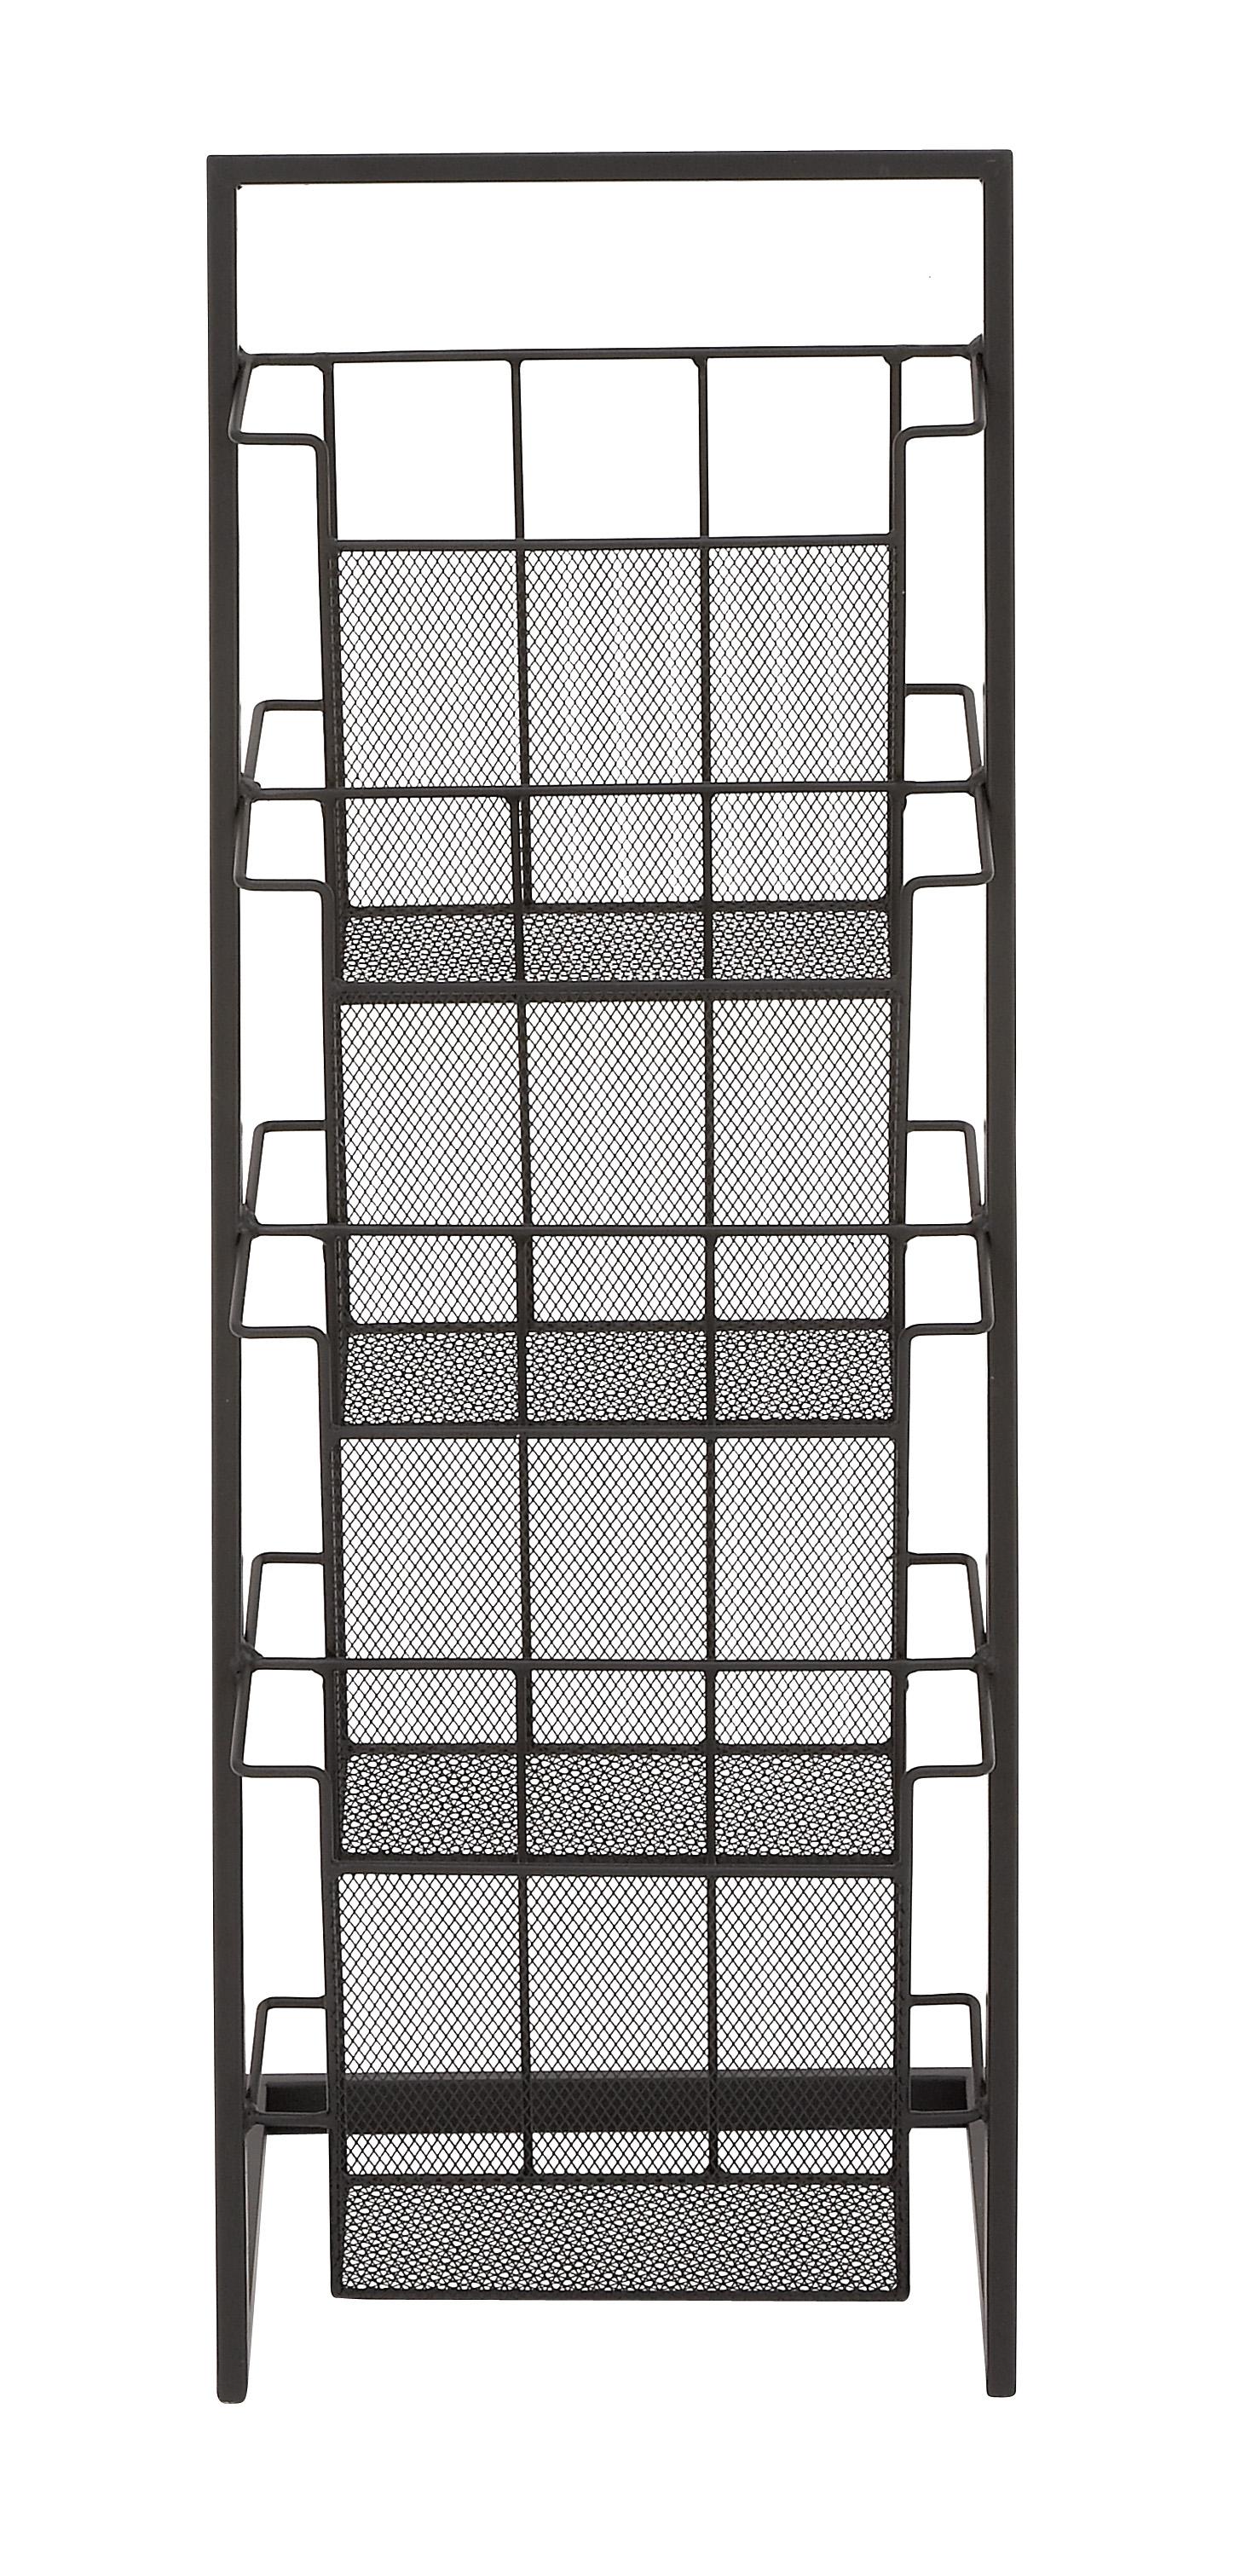 Decmode Modern 33 Inch 4-Tiered Metal Magazine Rack, Black by DecMode